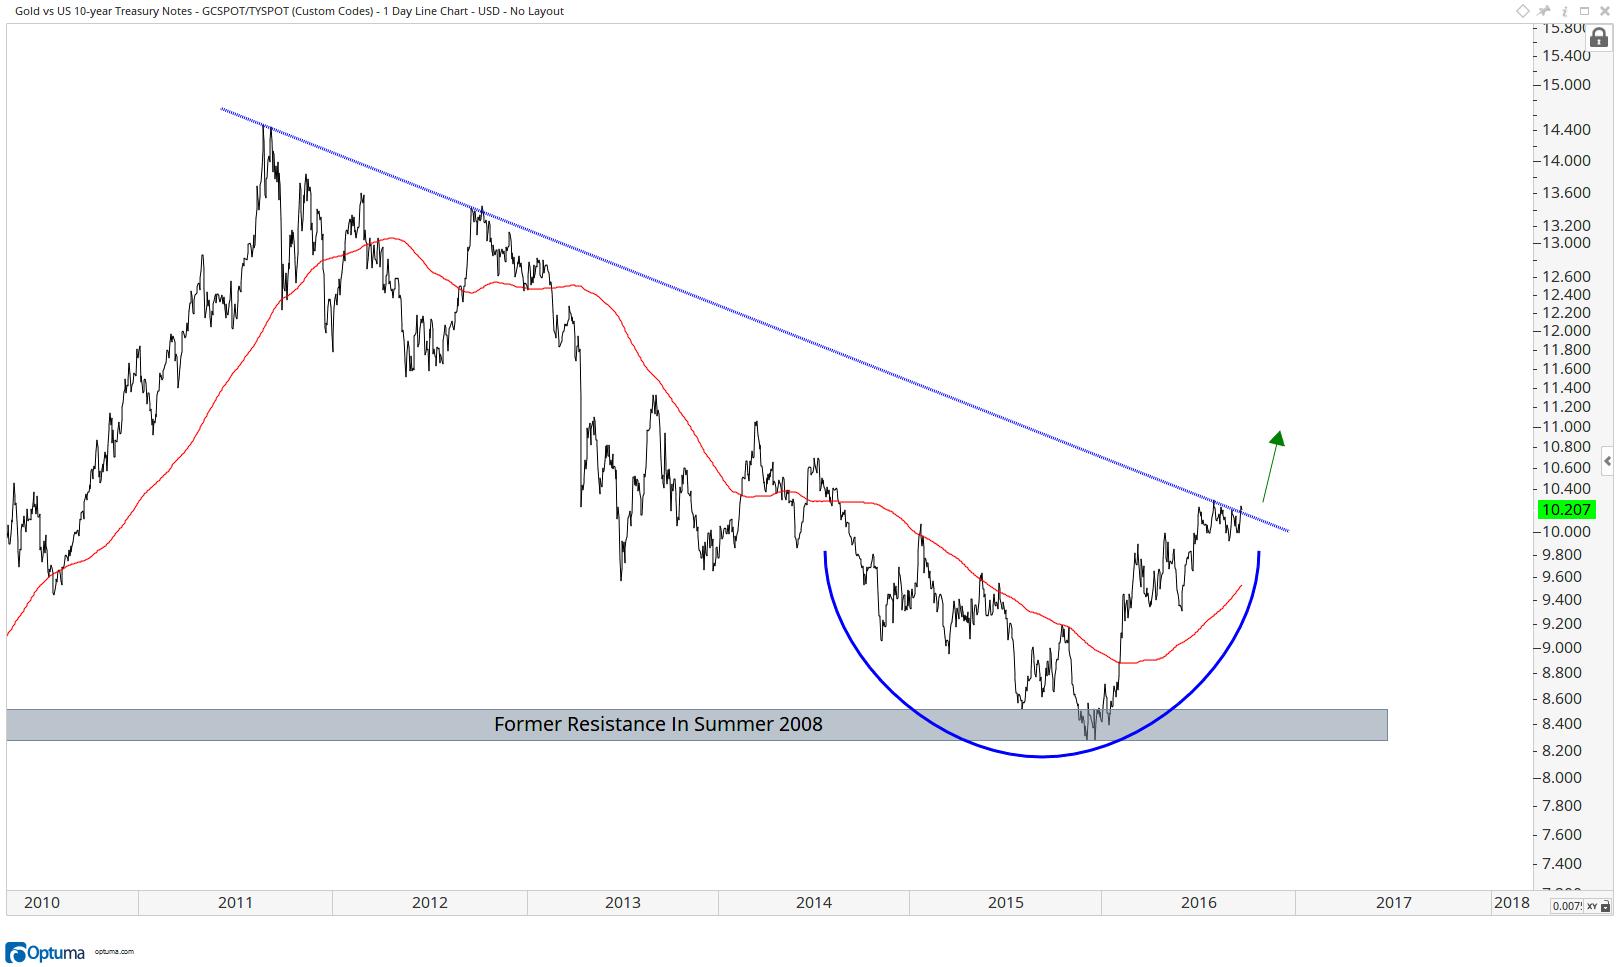 parets-gold-vs-treasuries